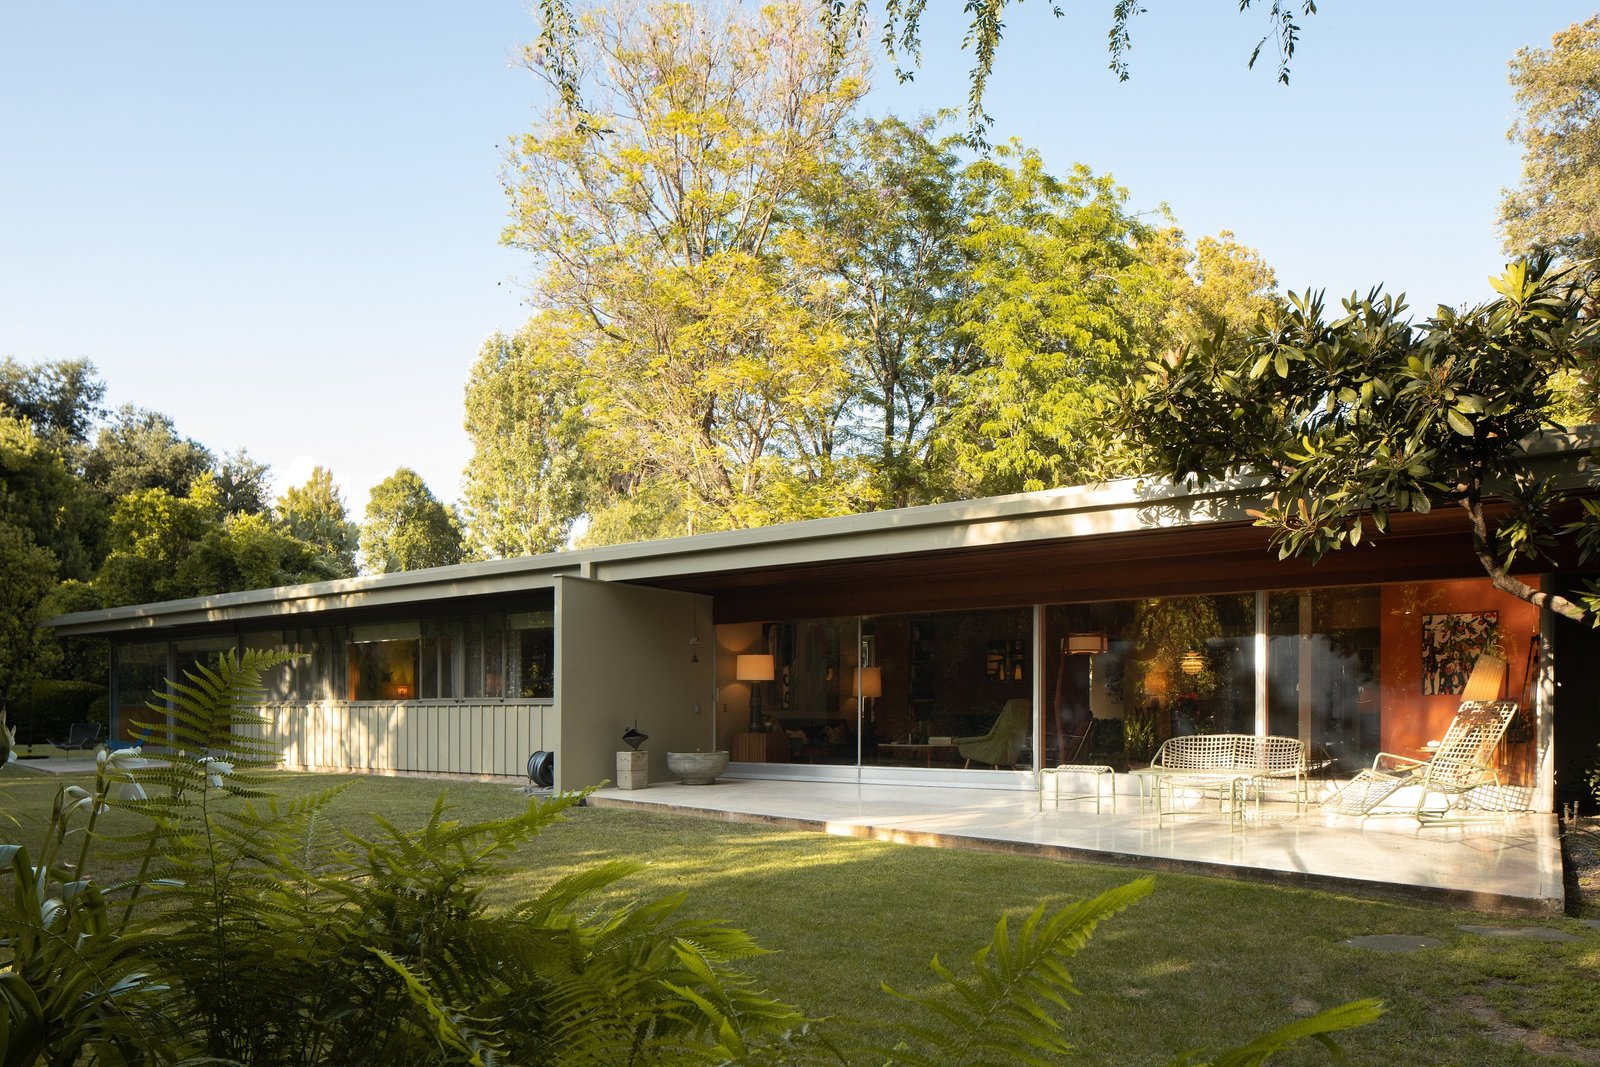 Richard Neutra Wilkins House Case Study House #13